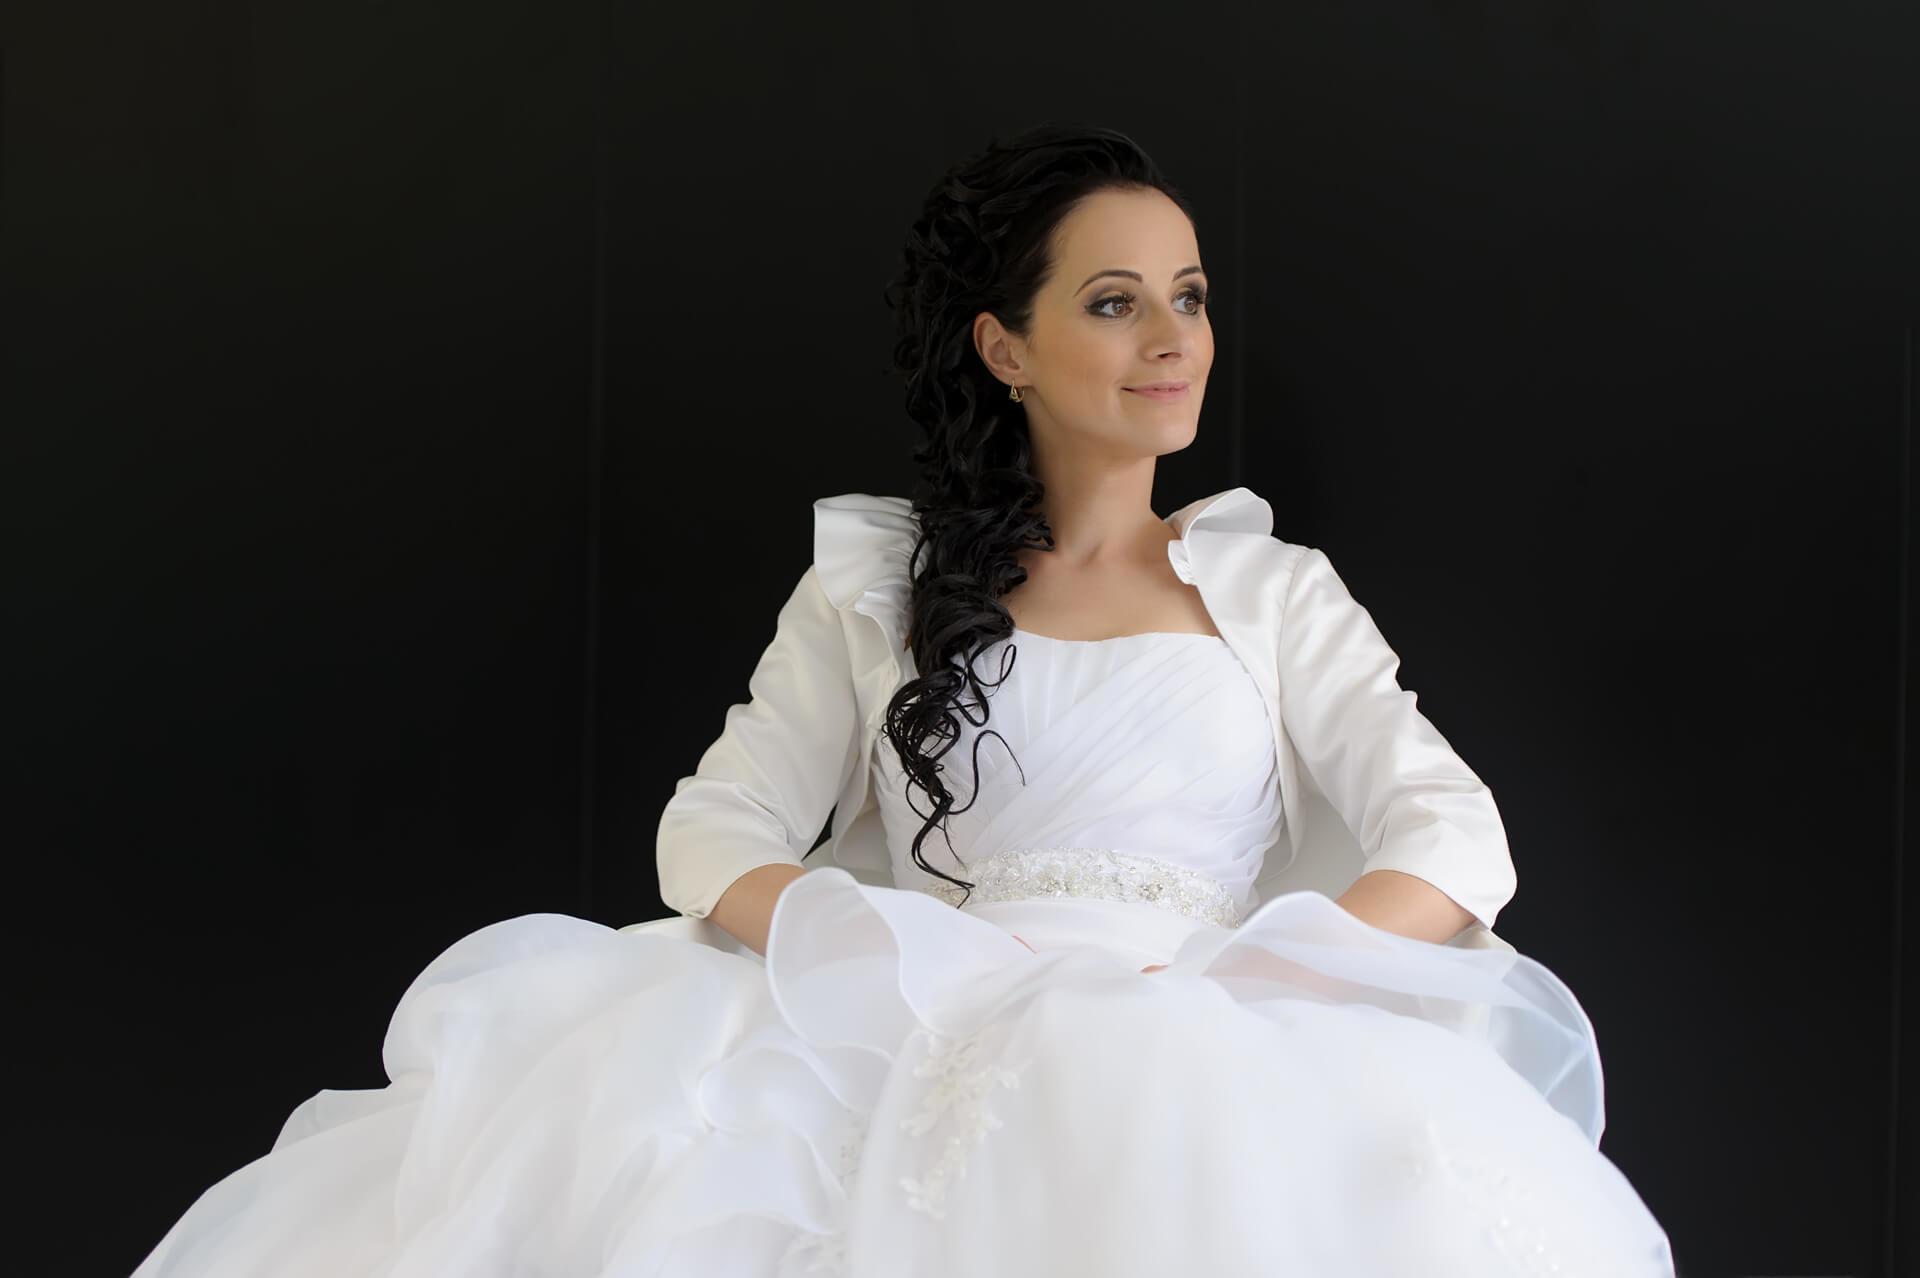 svadba svadobny portrety profesionalne fotenie fotograf Peter Norulak Kosice__40